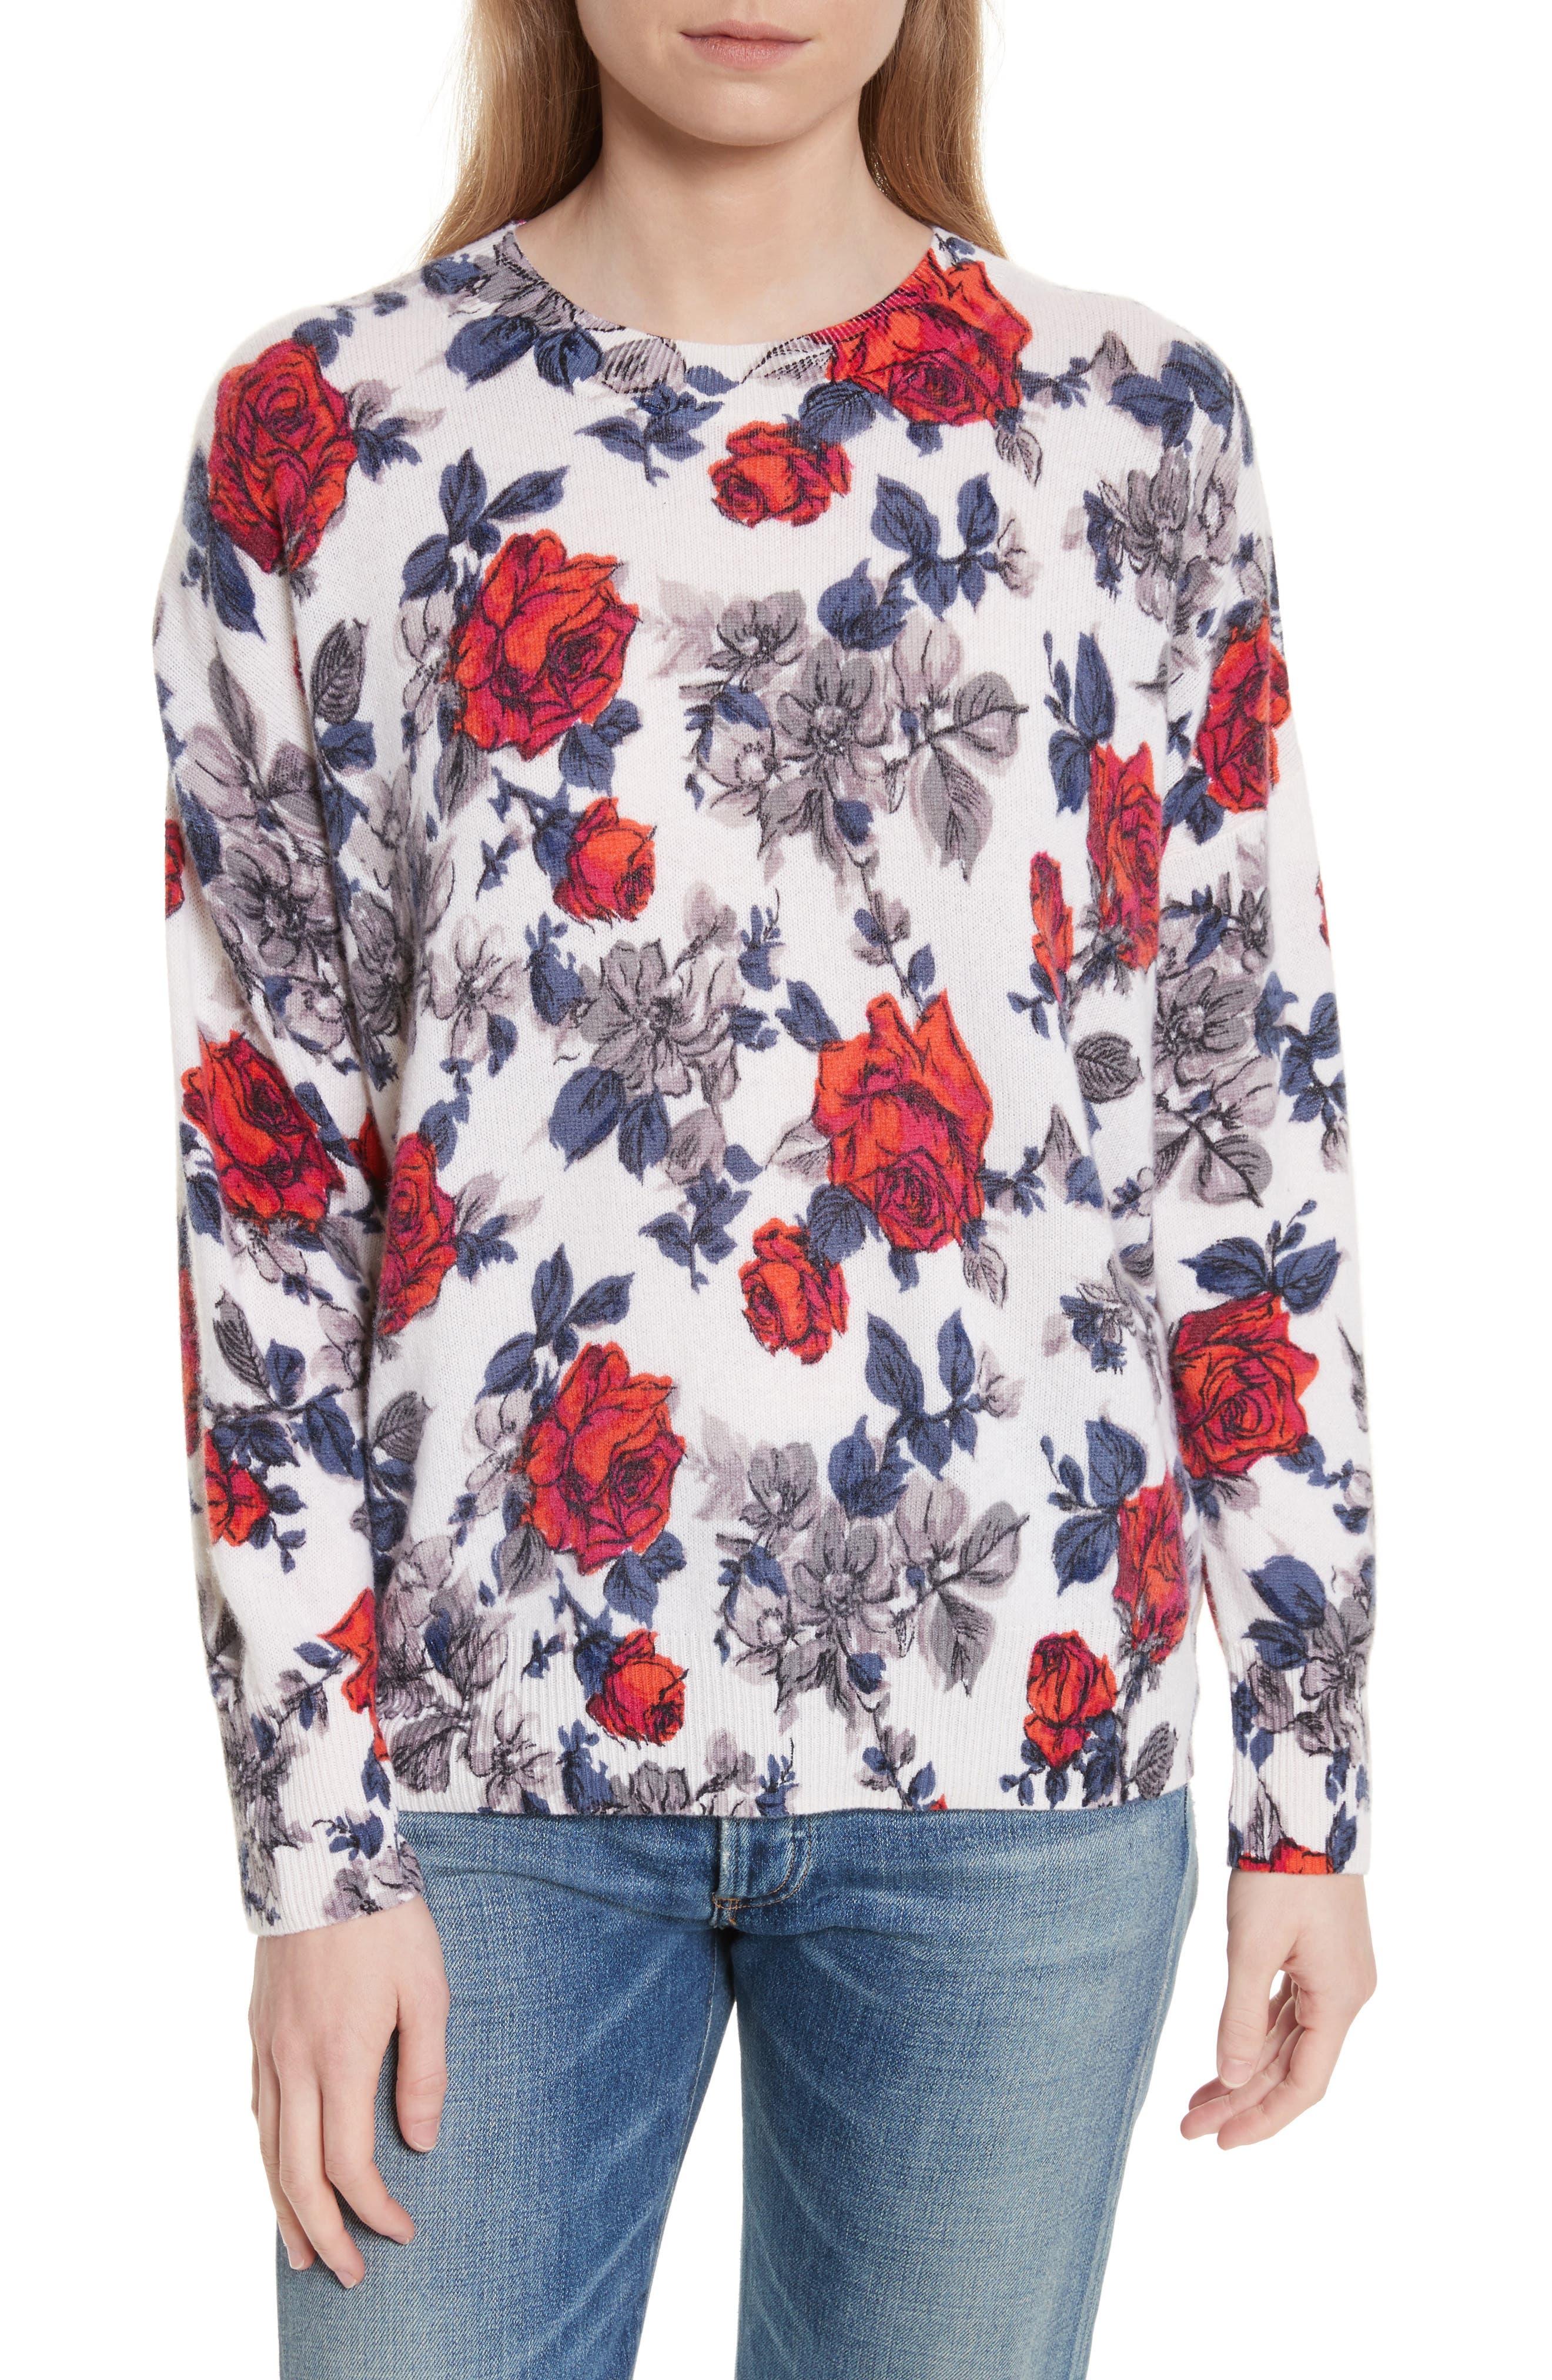 Main Image - Equipment Melanie Flower Print Cashmere Sweater